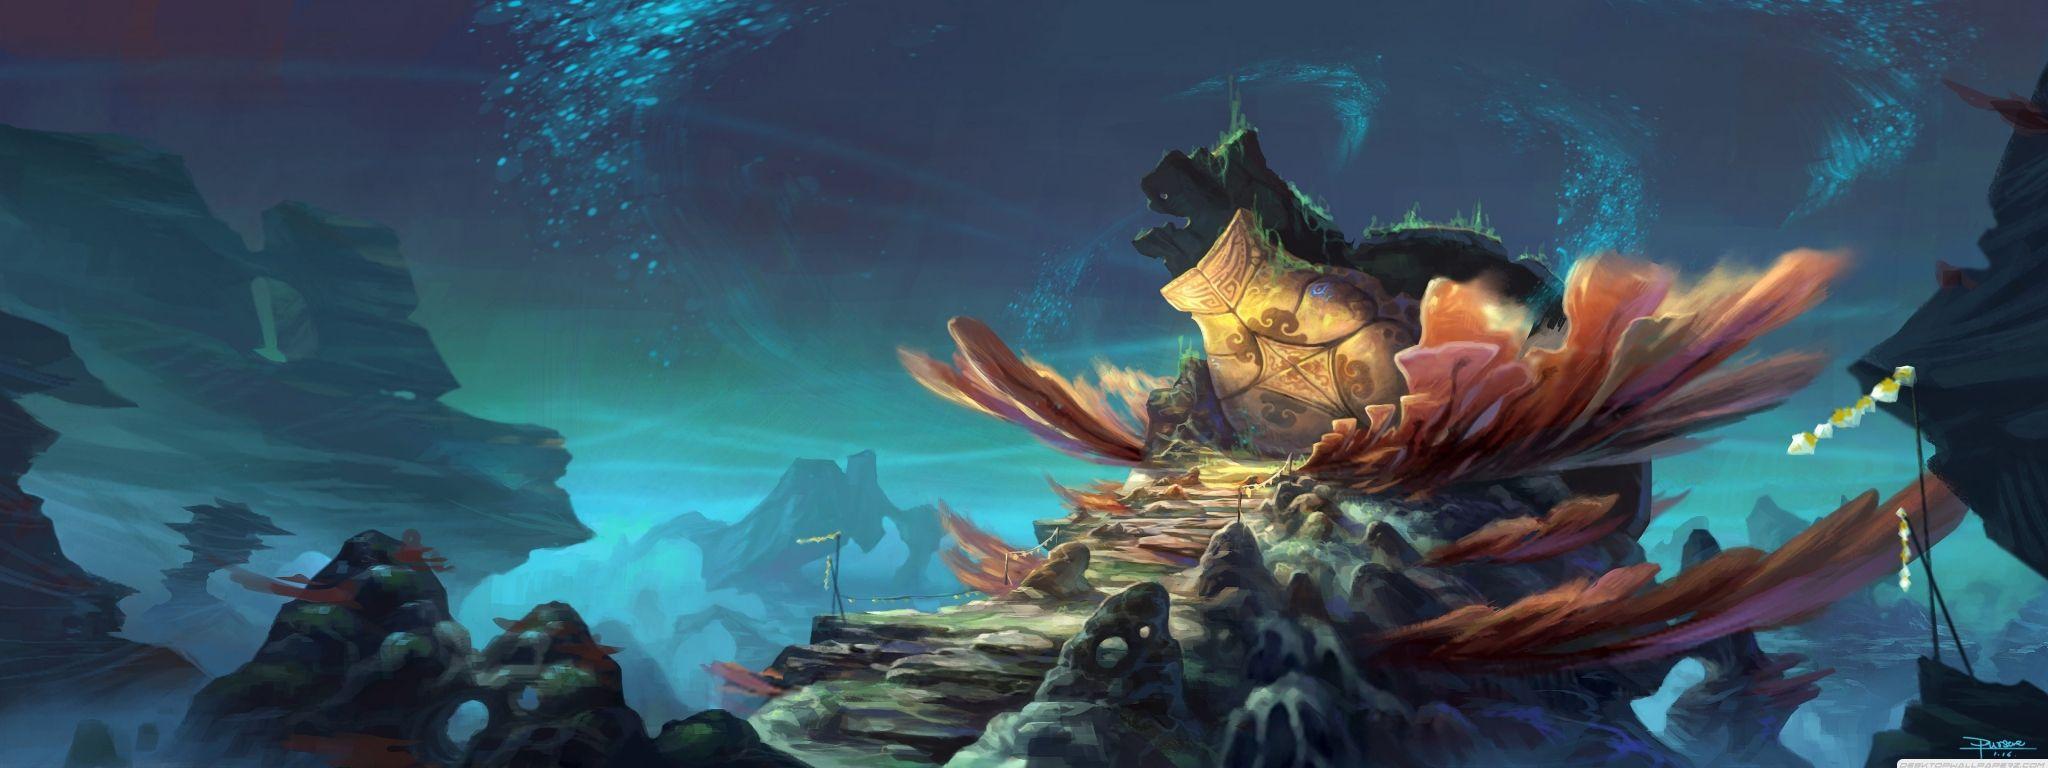 Fantasy Landscape Artwork Dual Screen Wallpaper 2048×768